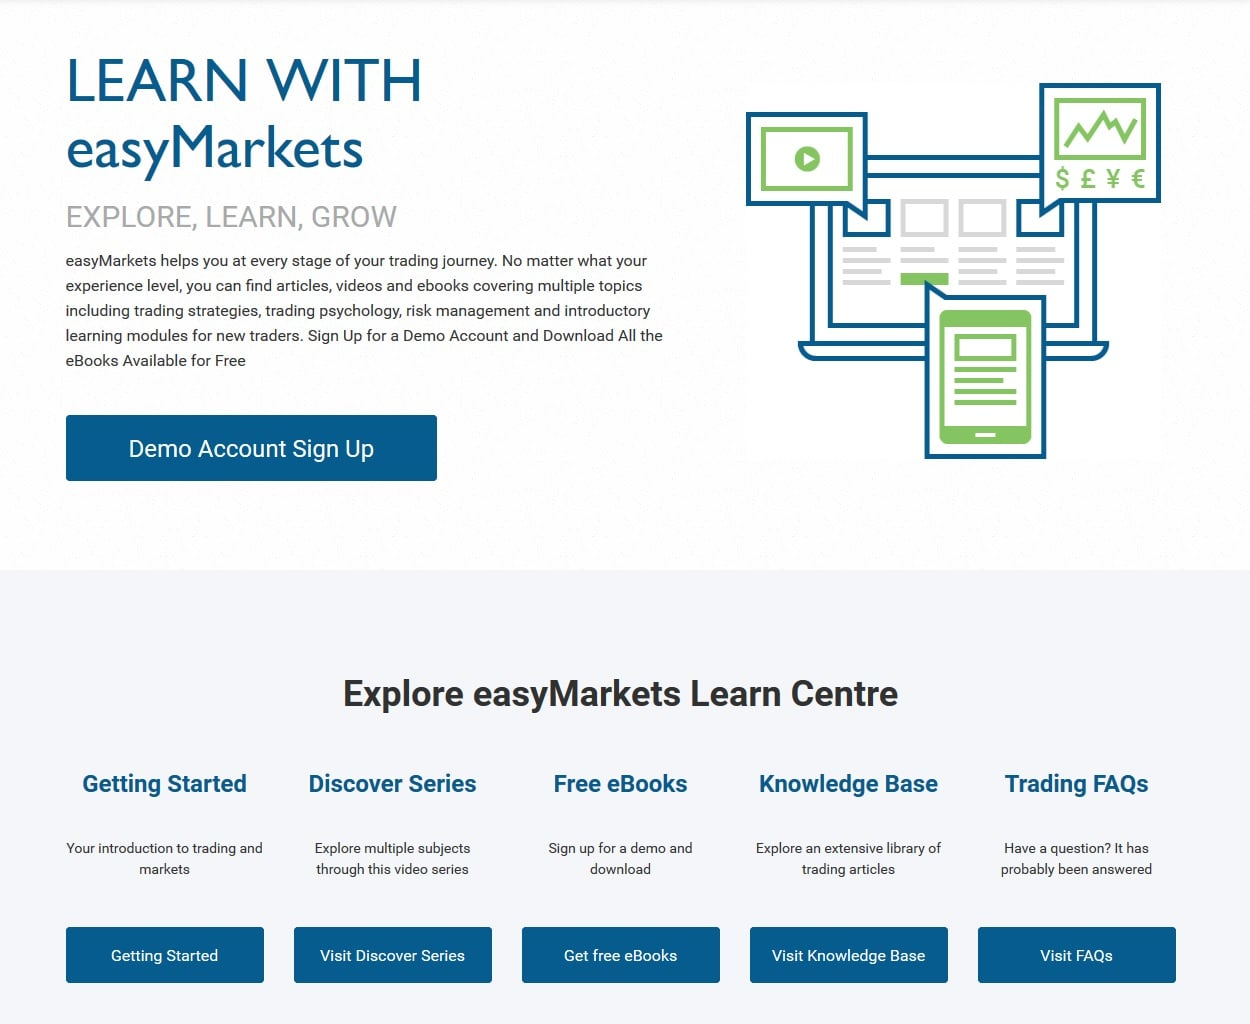 easyMarkets Learn Centre